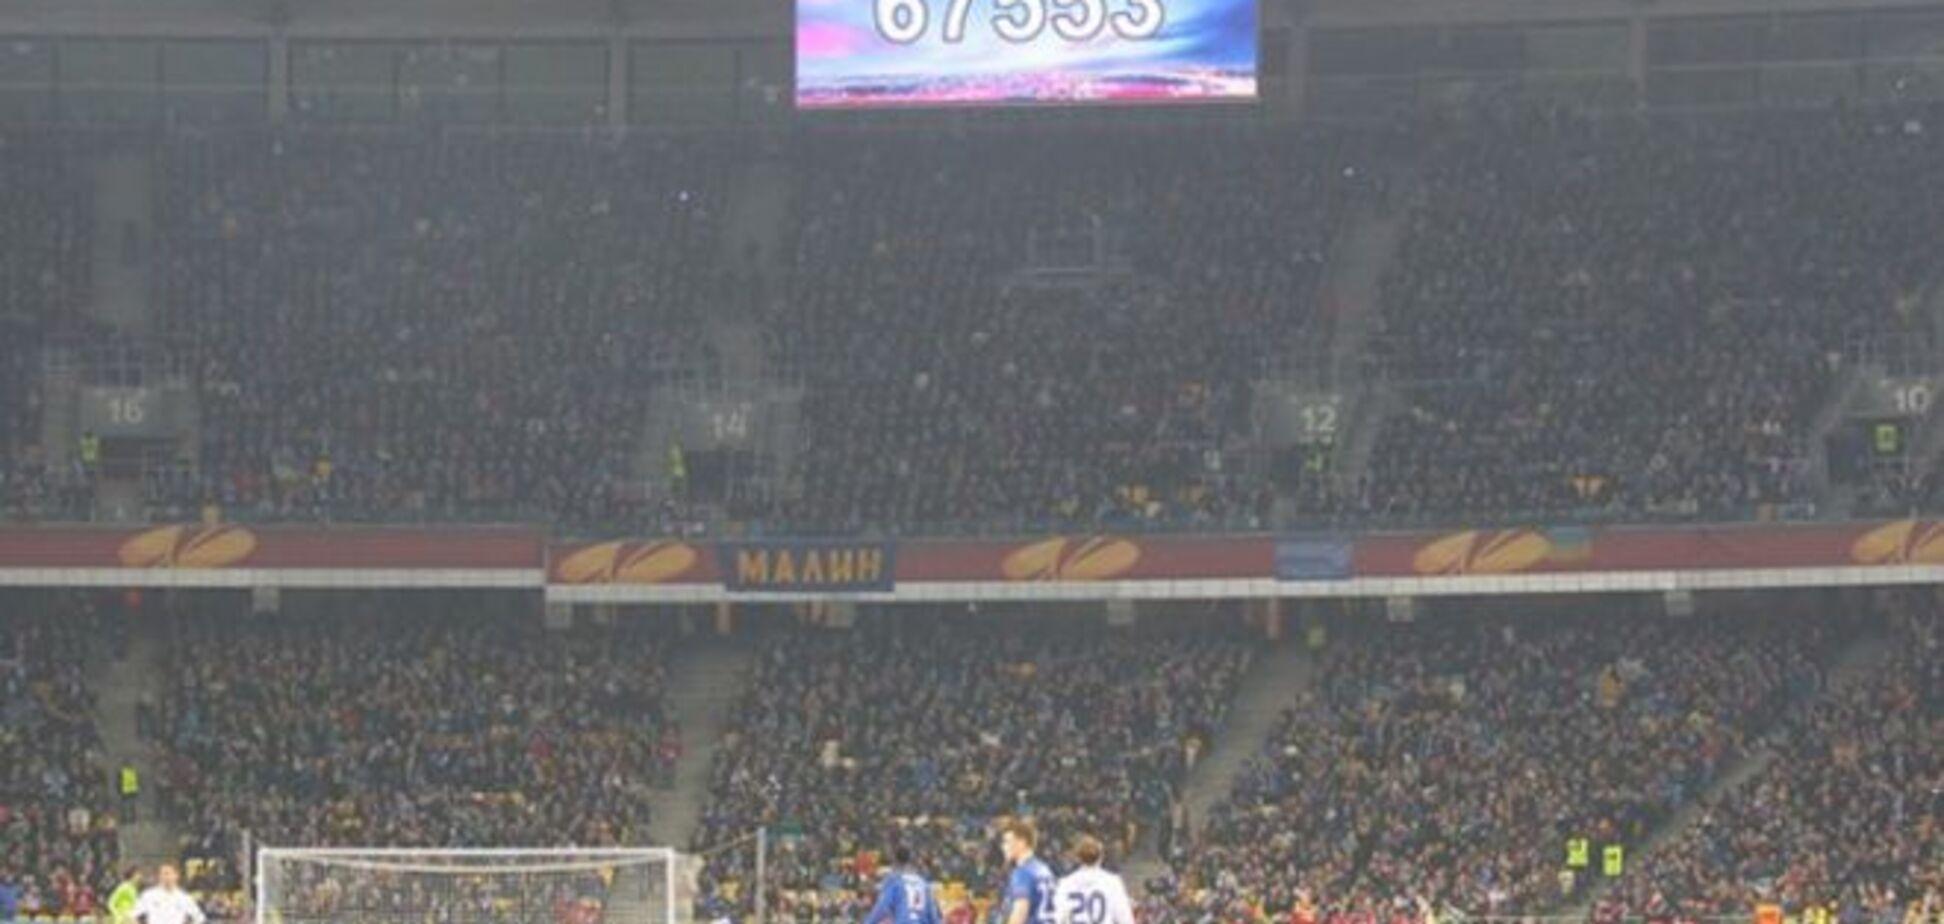 'Динамо' попало под расследование УЕФА